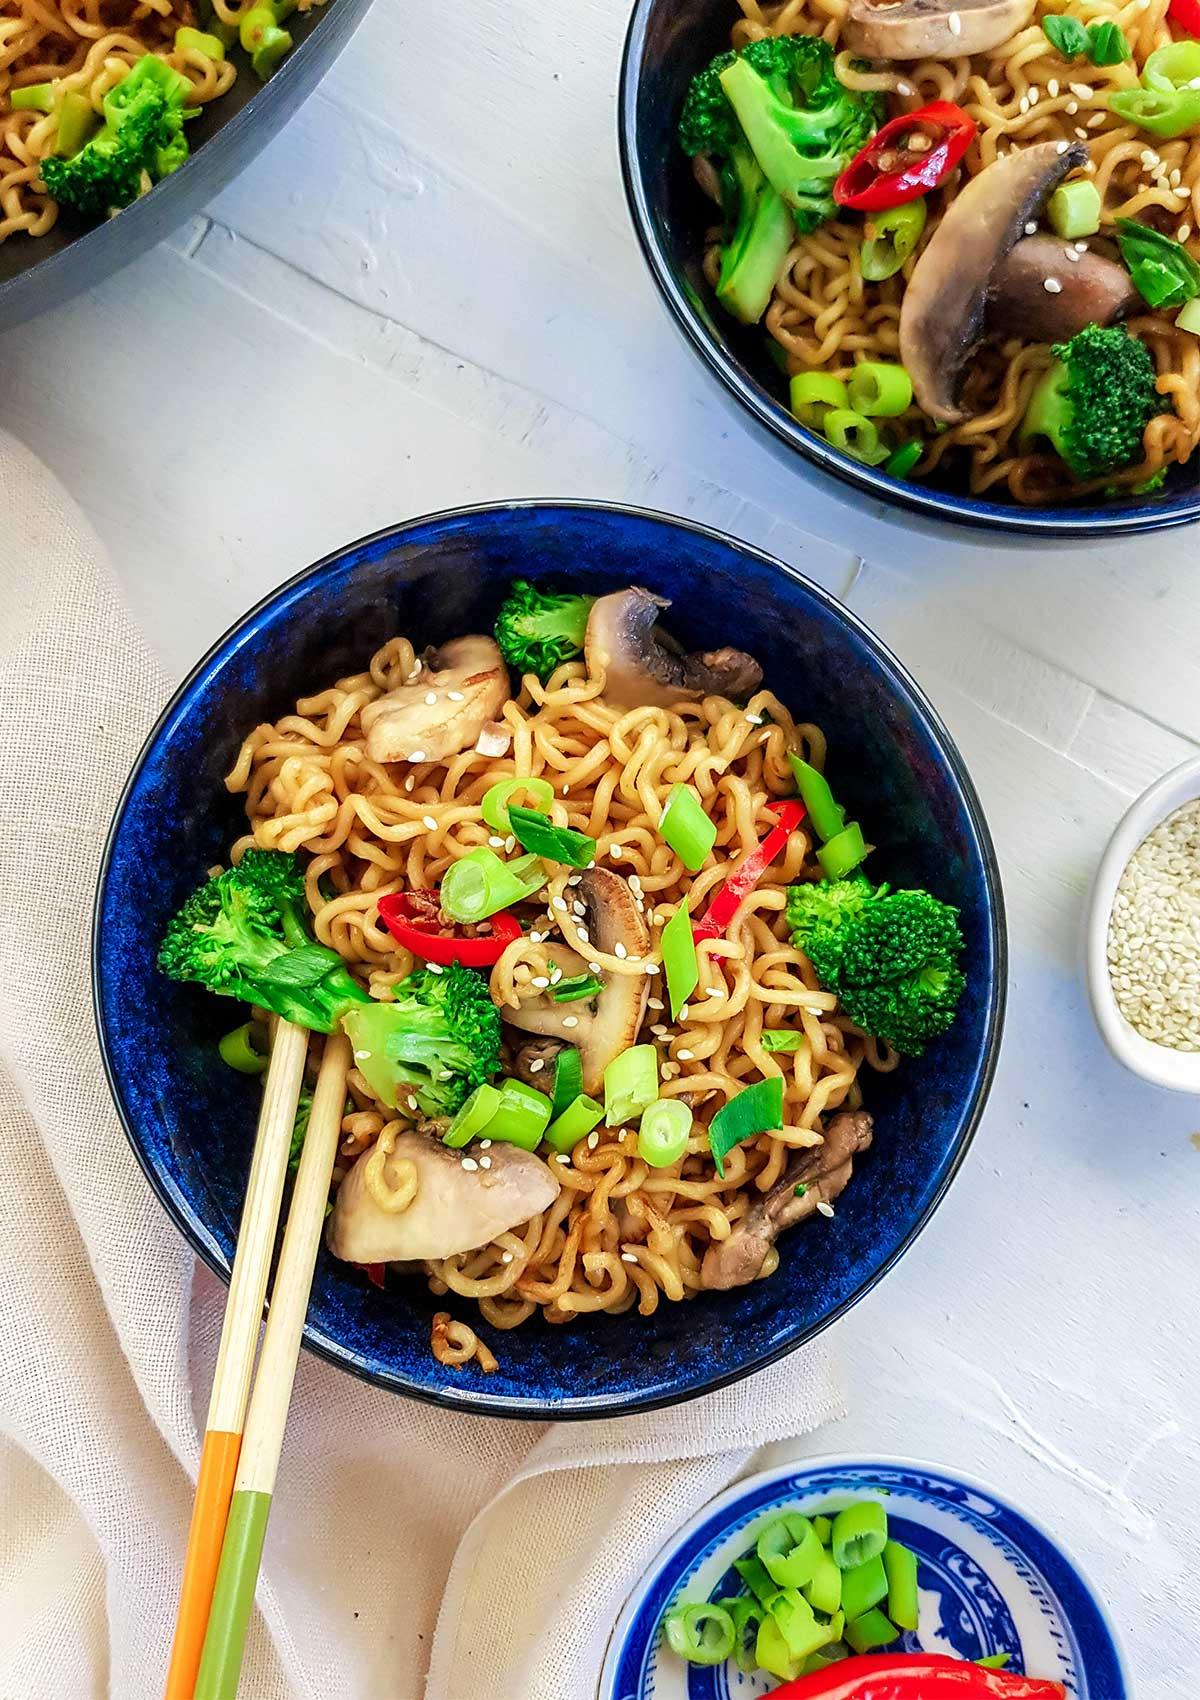 Vegan Ramen Stir fry in a bowl